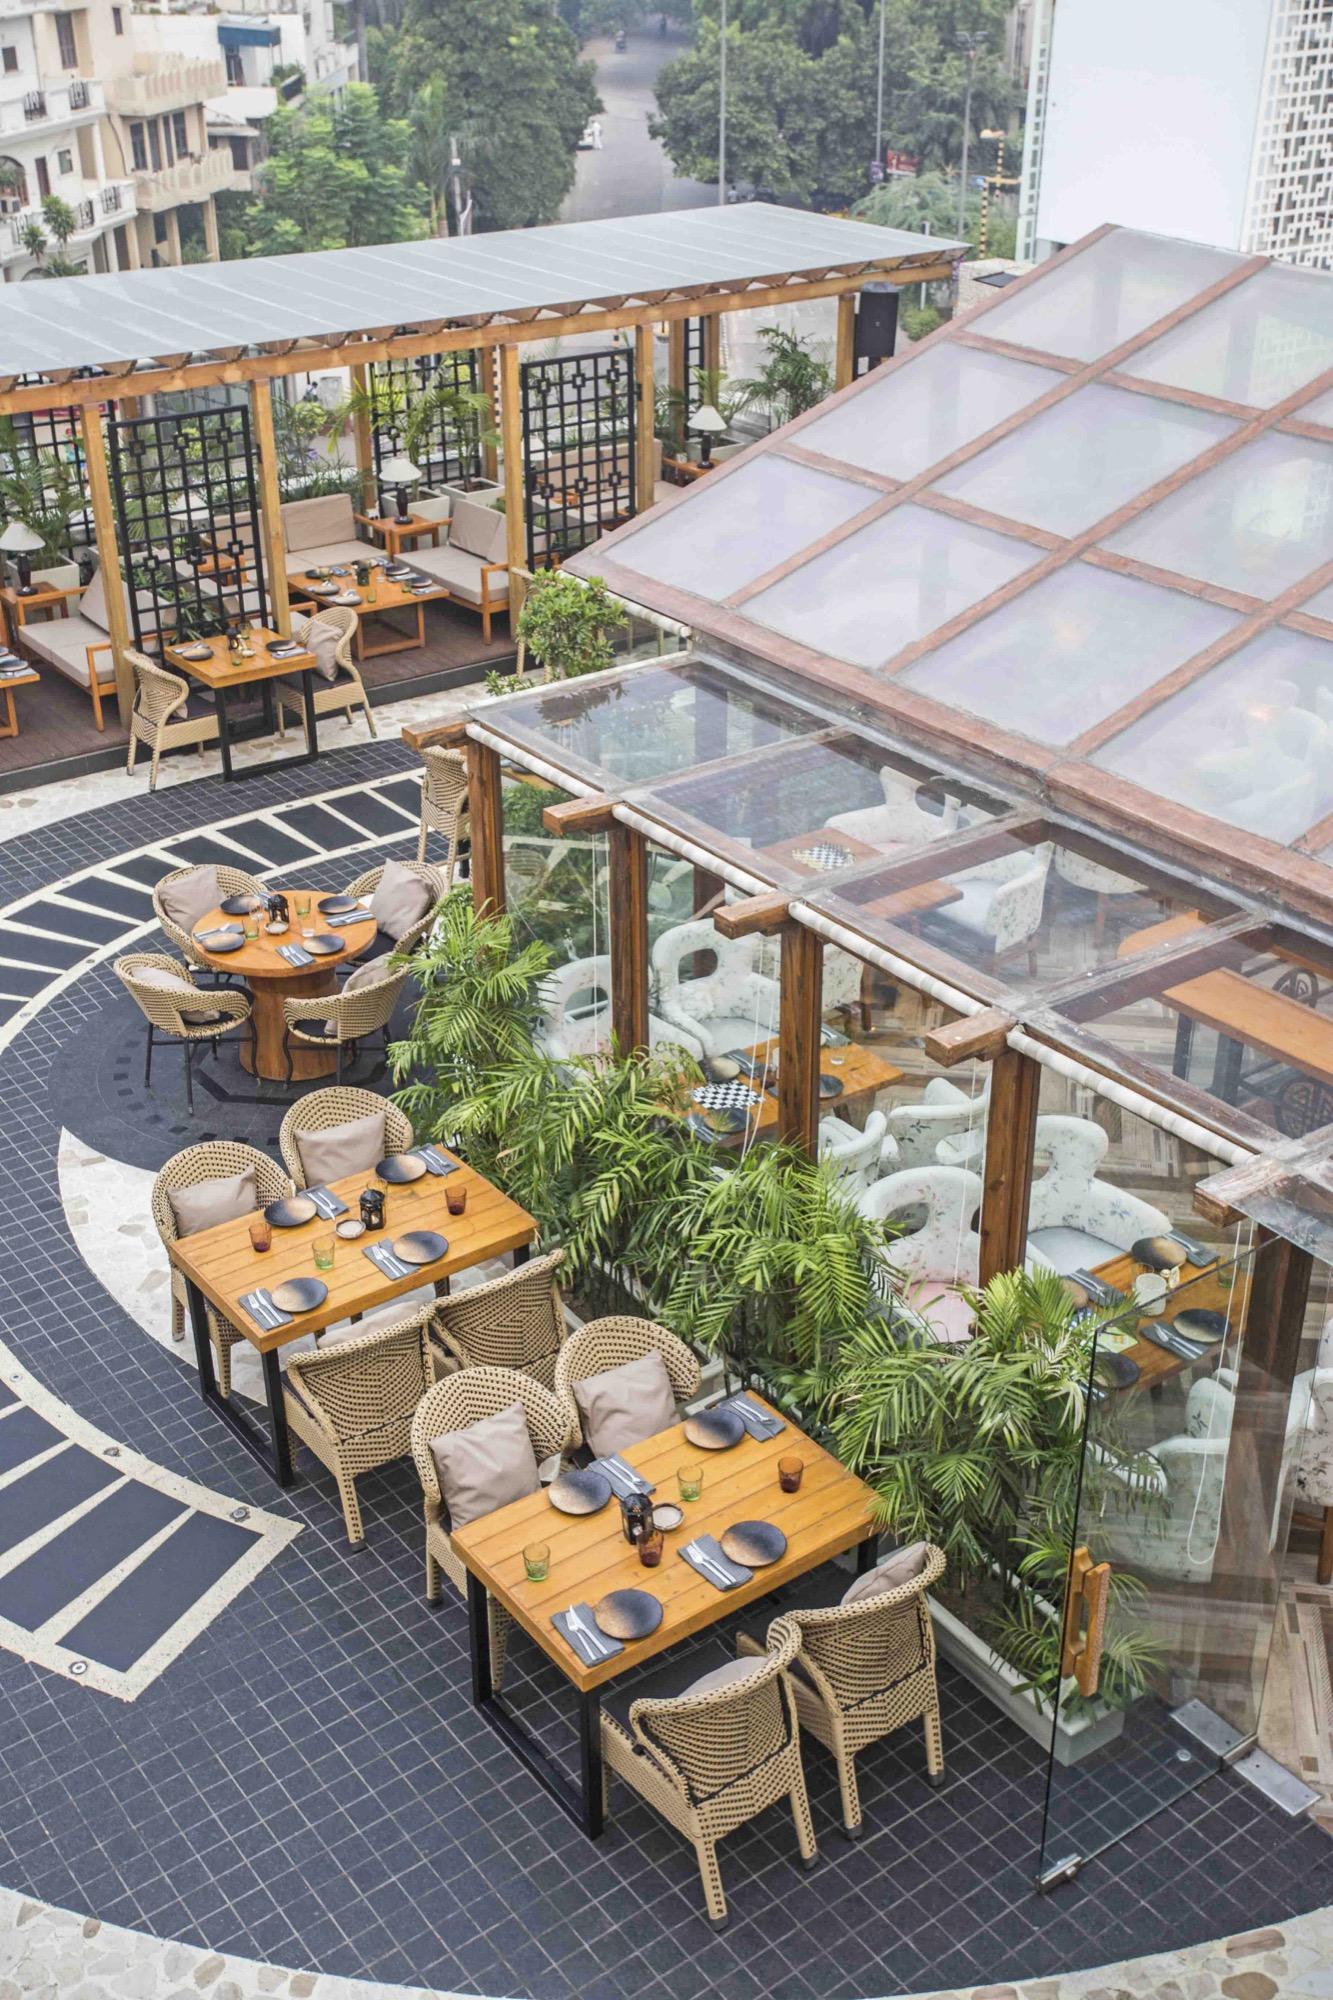 Best of Asia Village, Interior design for a restaurant at Delhi by Aspire Designs 11